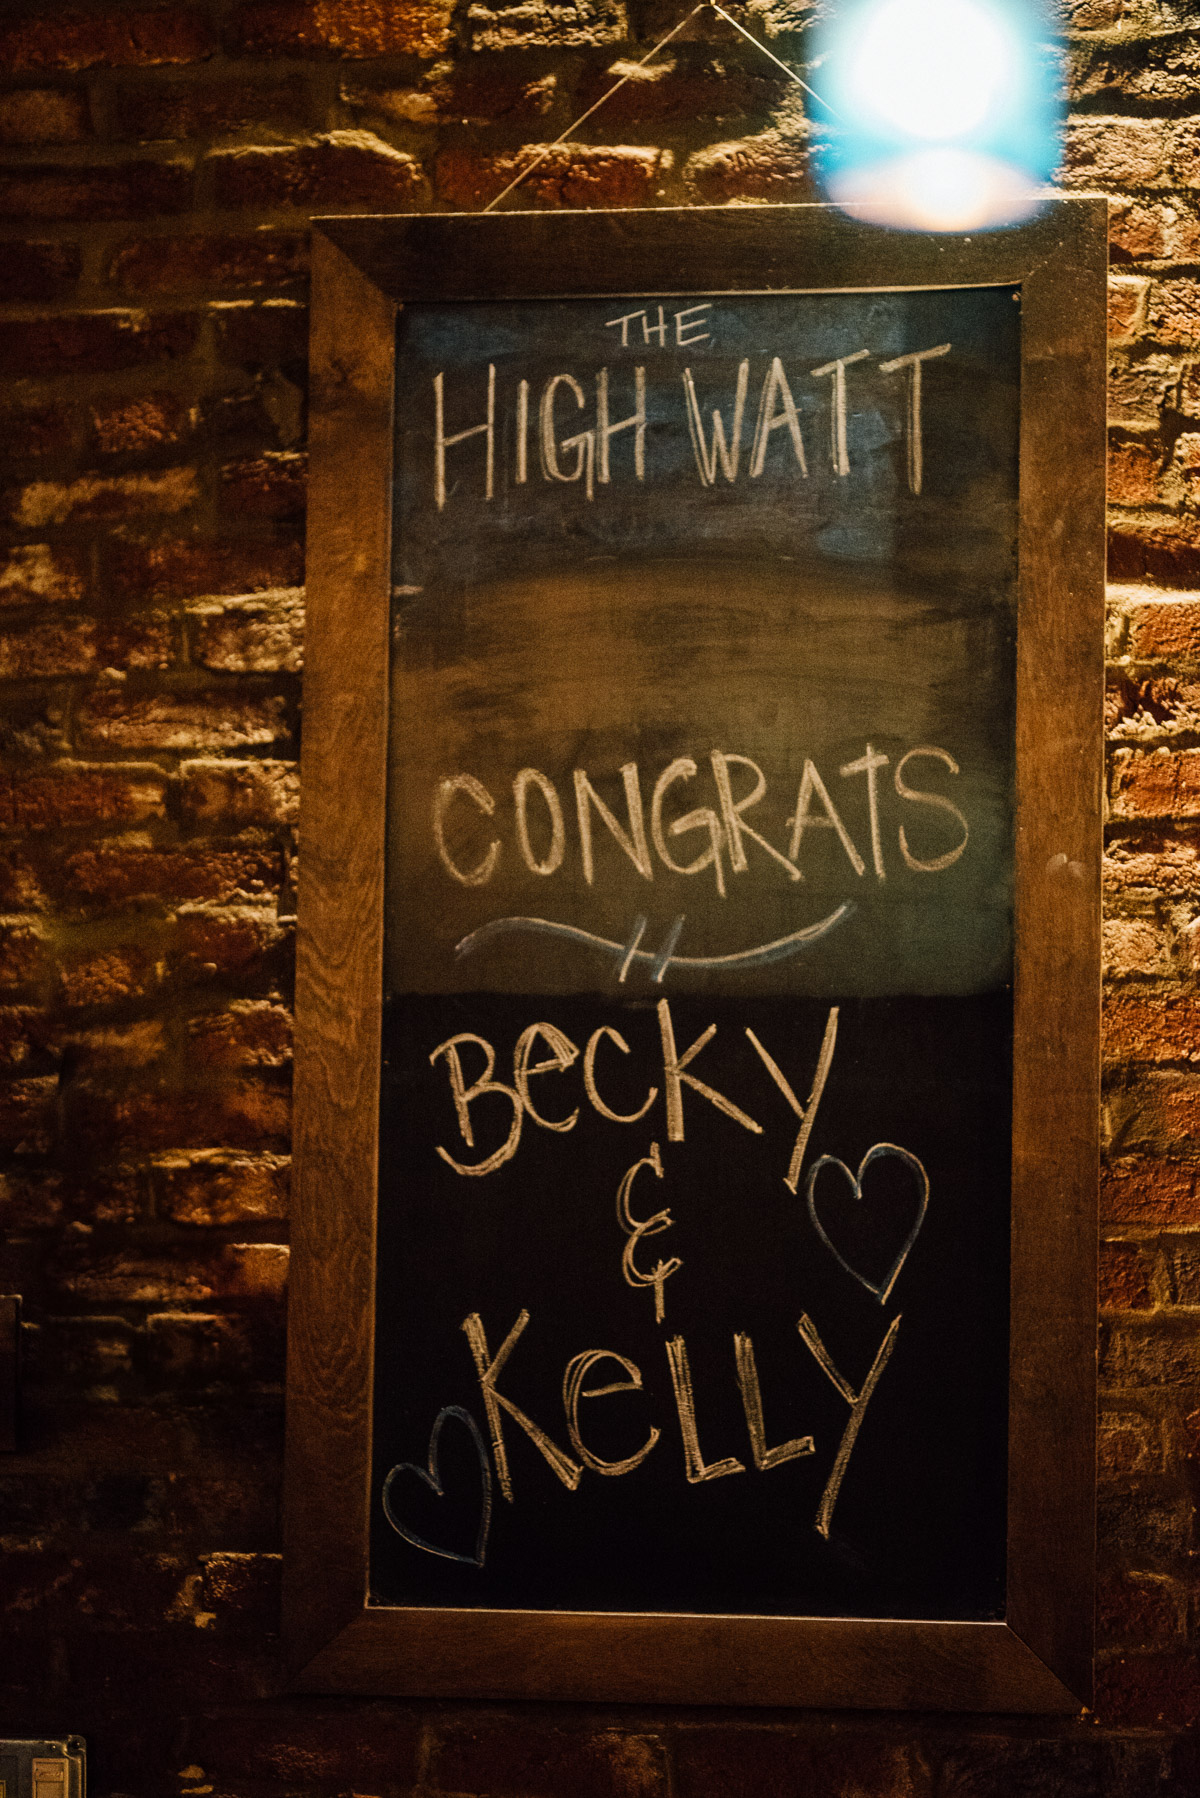 highwatt-congrats Becky and Kelly | Intimate Backyard Wedding